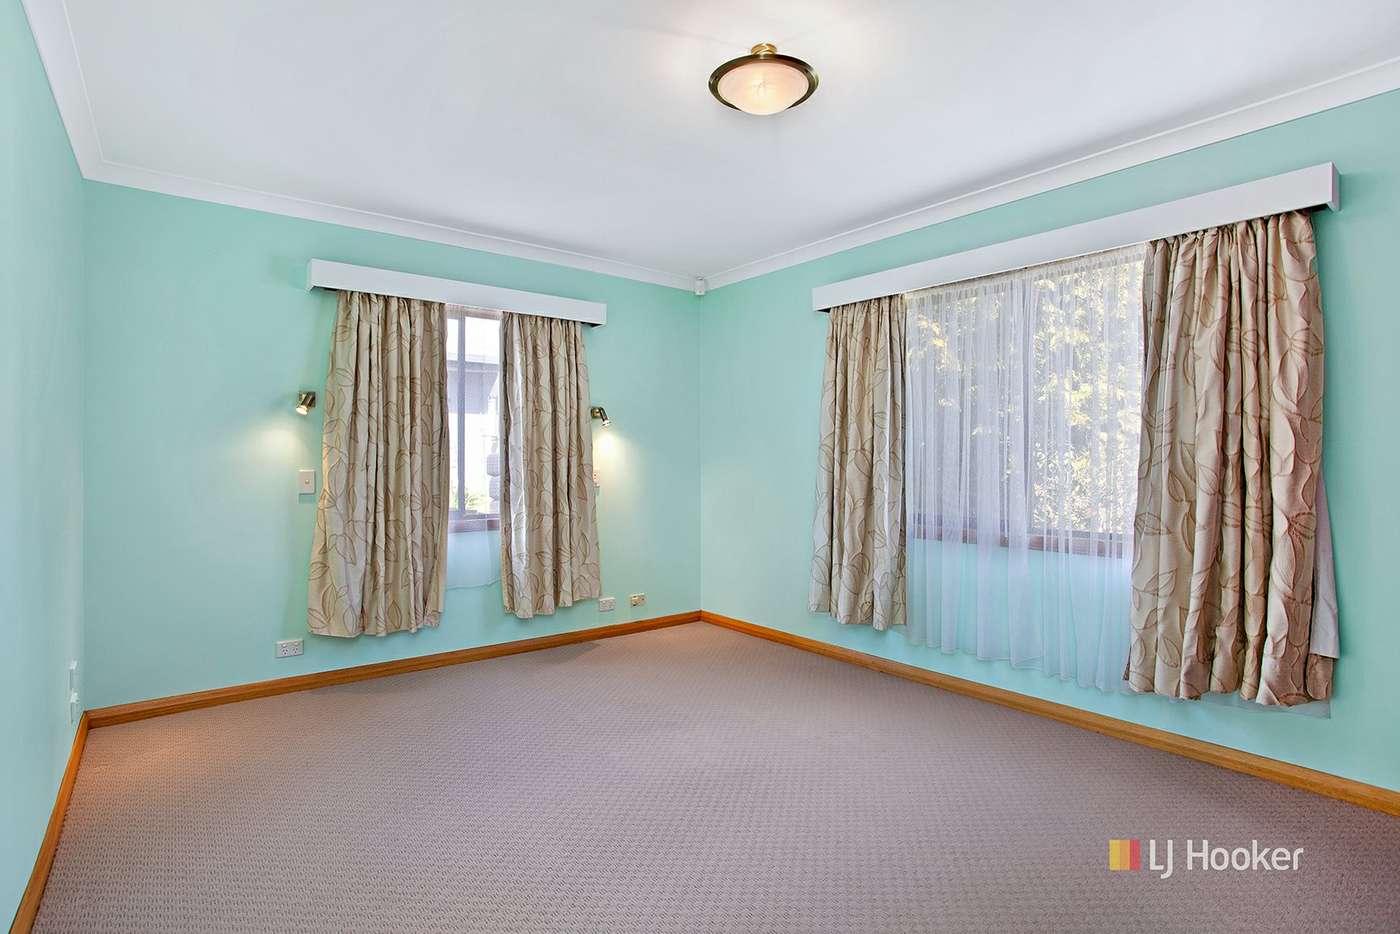 Seventh view of Homely house listing, 44 Park Street, Wynyard TAS 7325